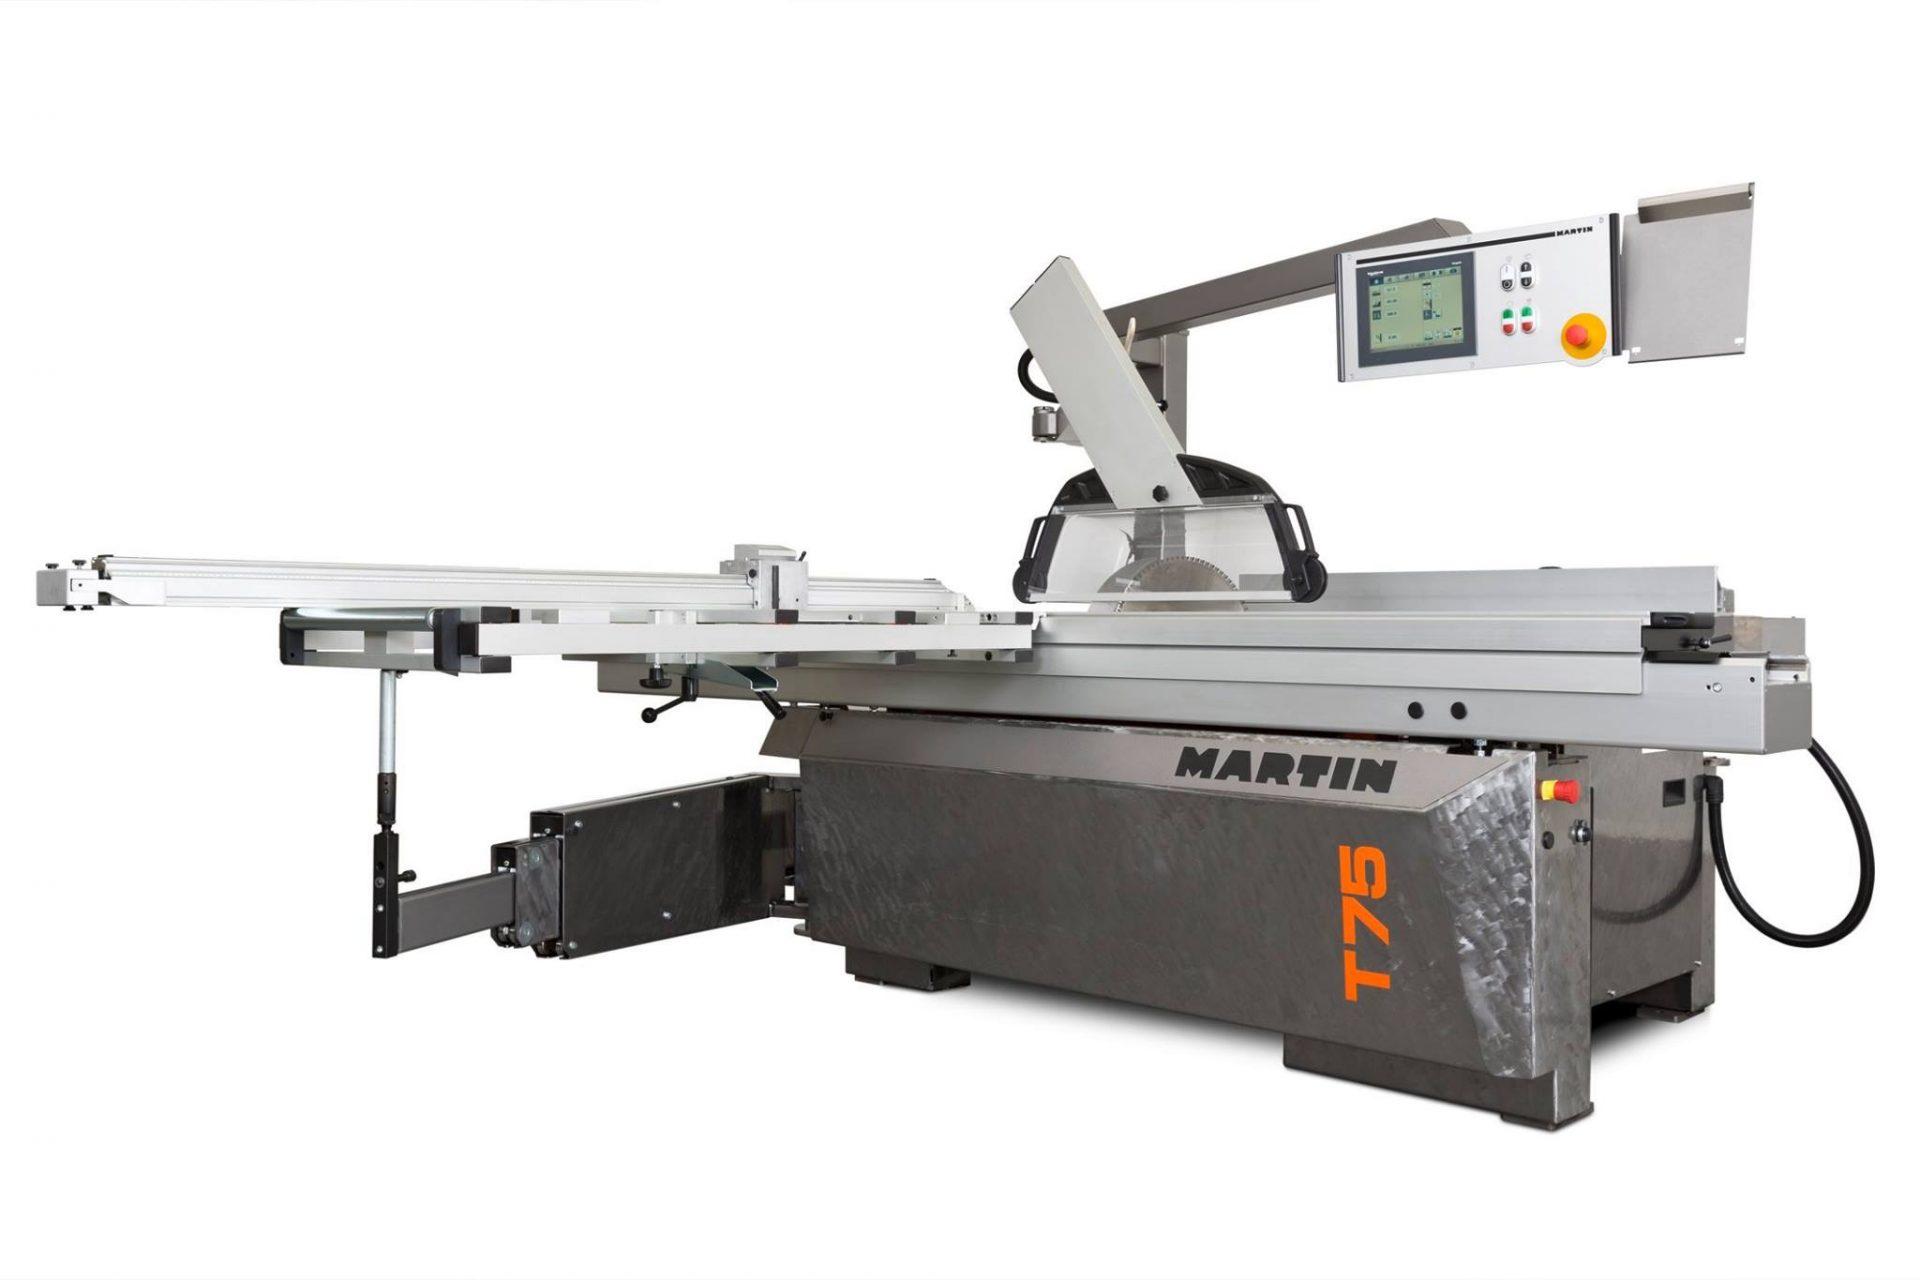 Martin T75 Prex Sliding Table Panel Saw